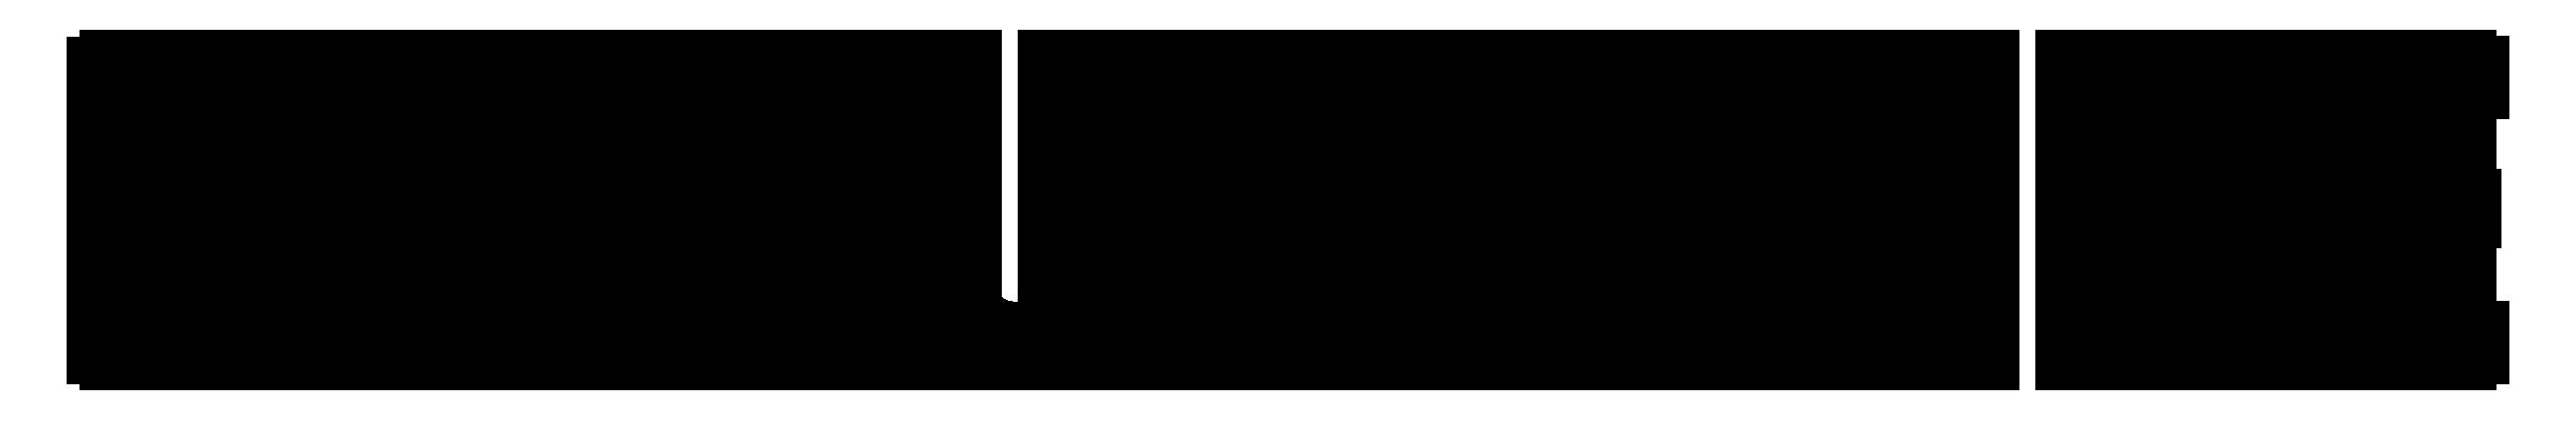 Influencive black logo